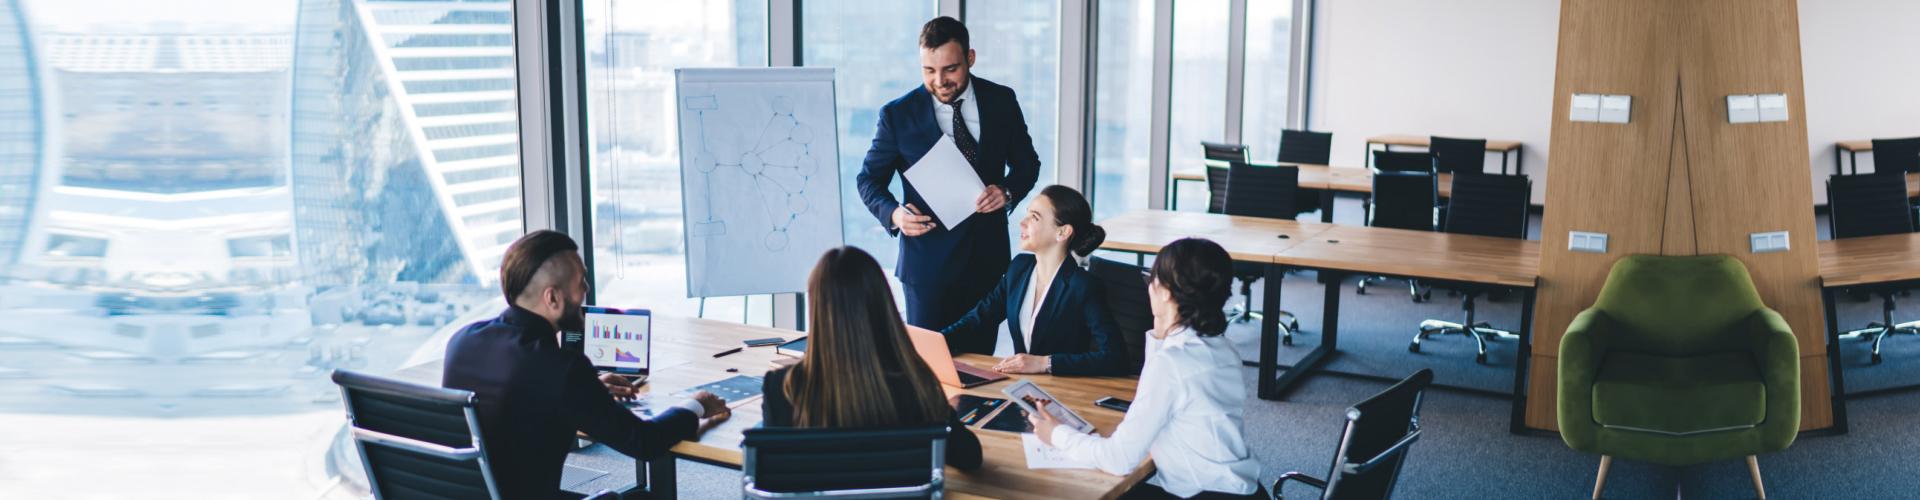 Adult entrepreneur in formal wear standing in conference room